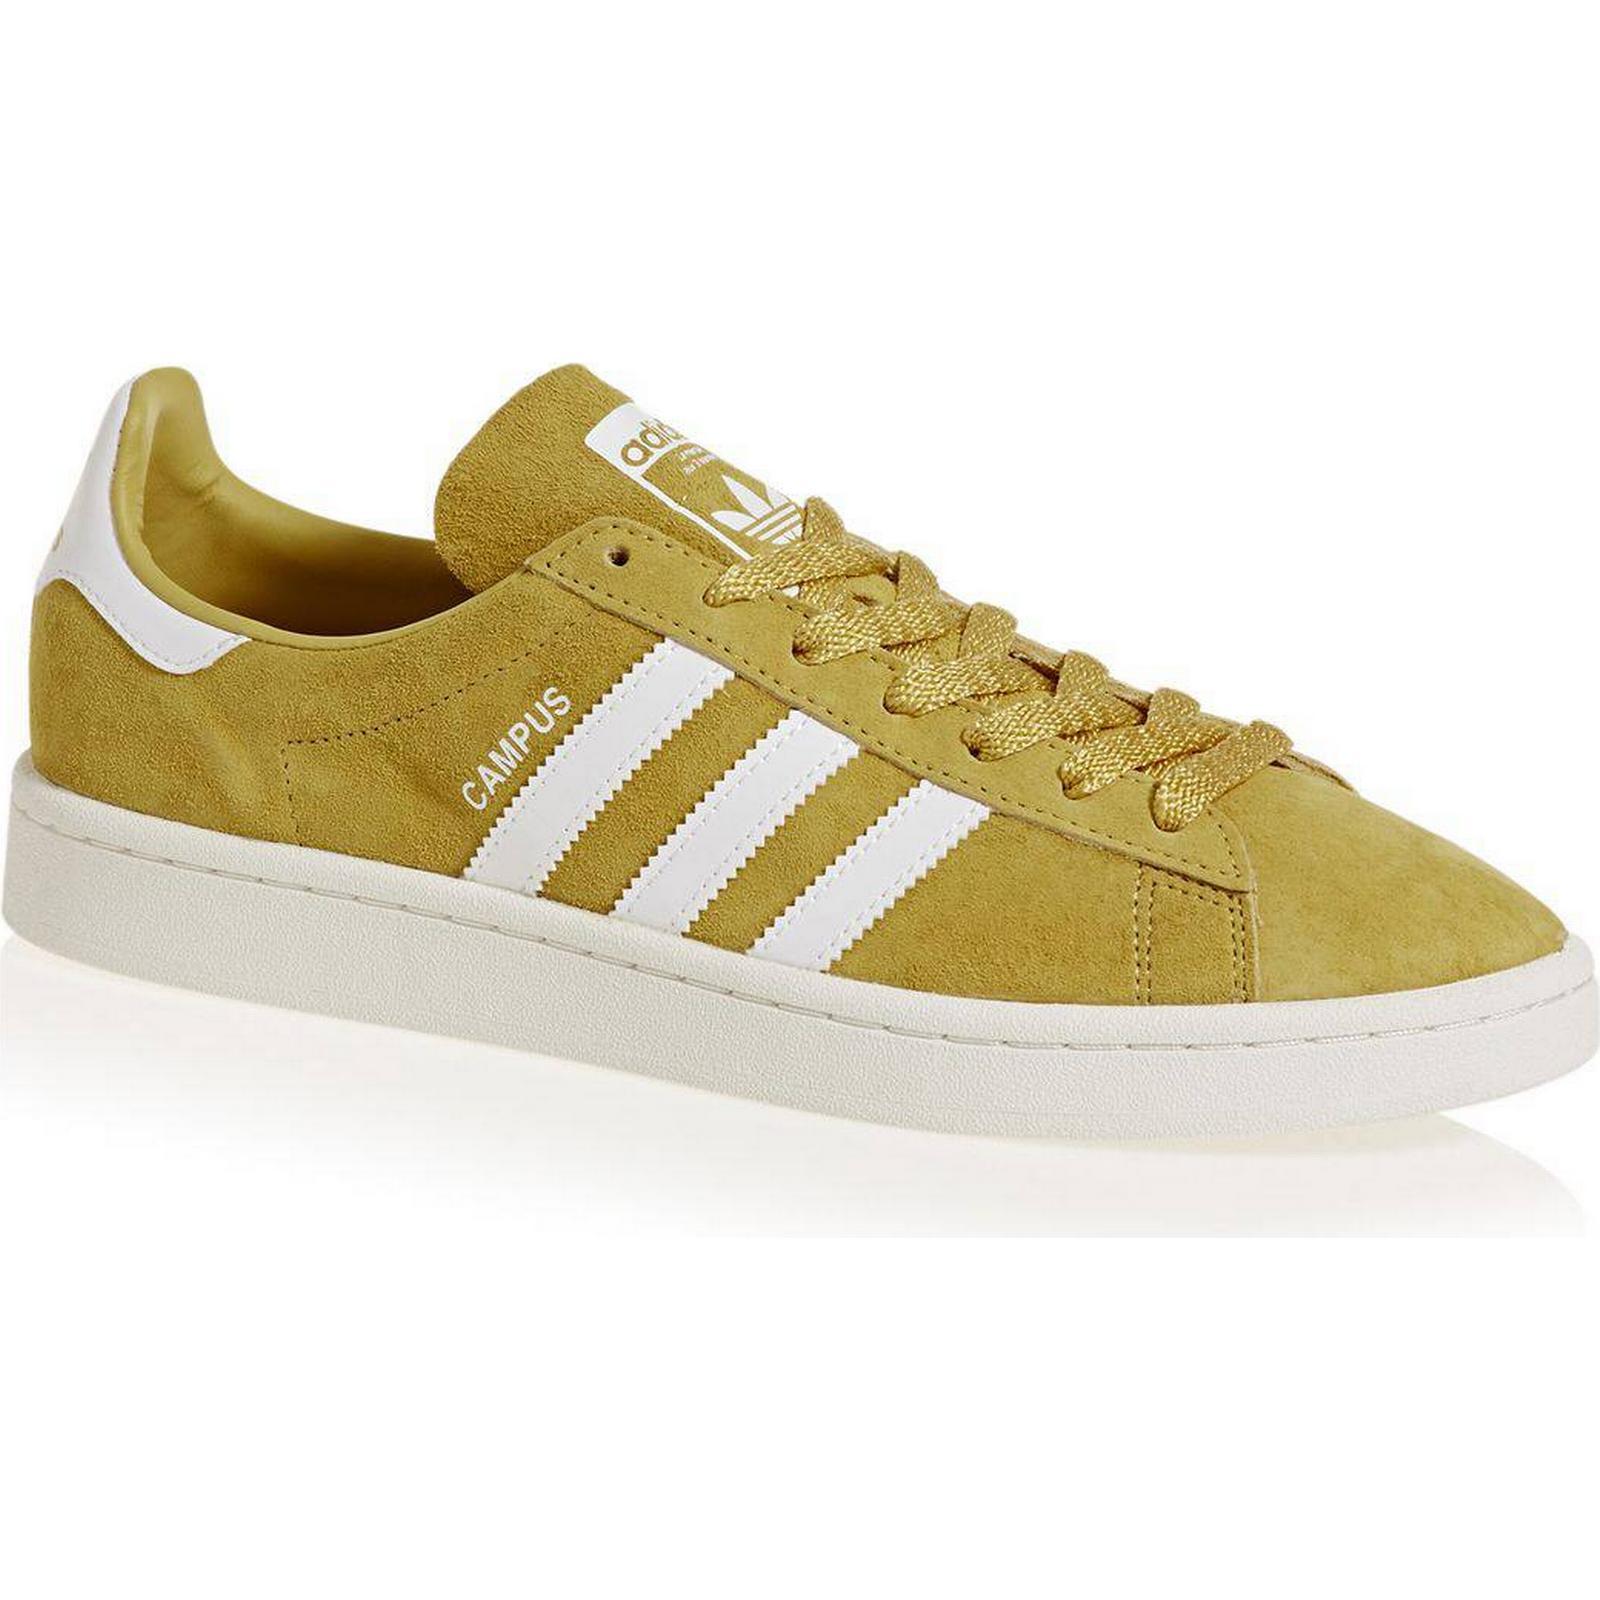 Adidas Originals Trainers - Pyrite/White/Chalk Adidas Originals Campus Trainers - Pyrite/White/Chalk - White 69d005